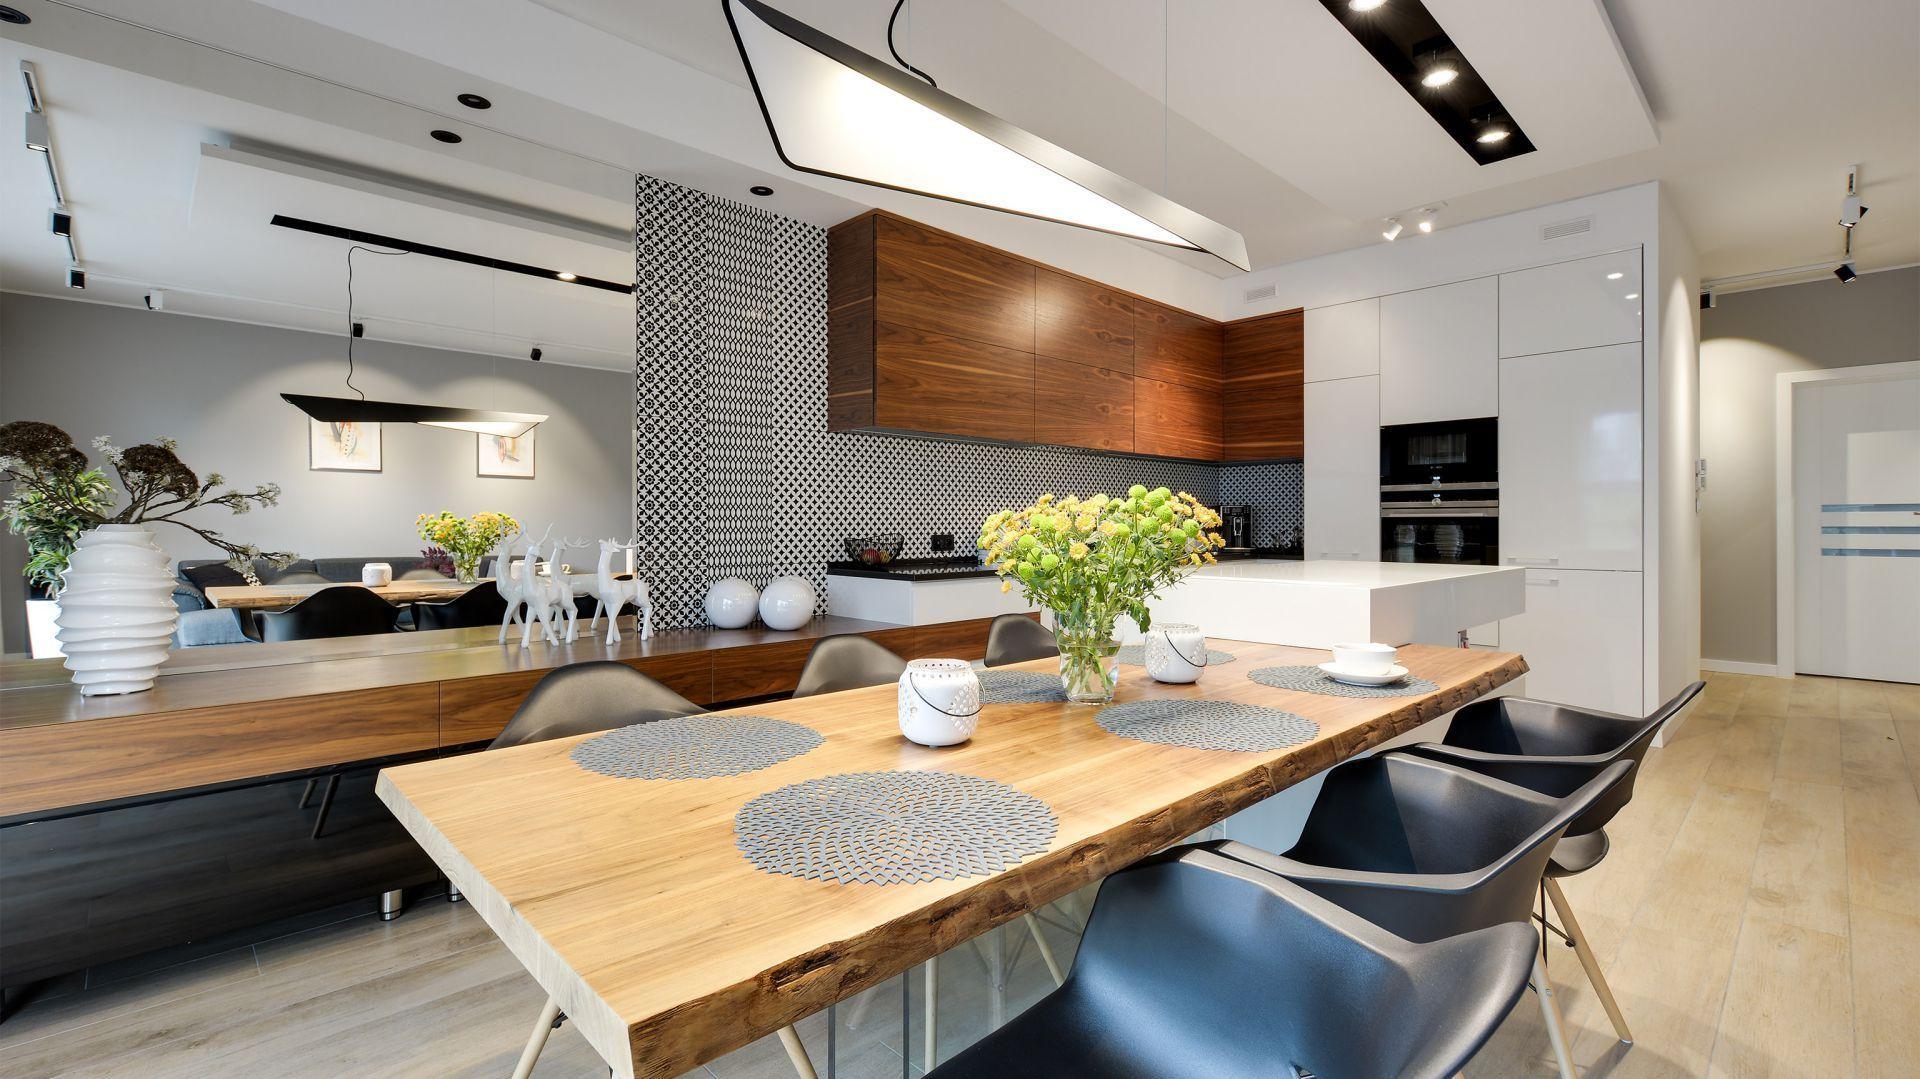 Kuchnia Z Jadalnia Projekt Malgorzata Mataniak Pakula Fot Radoslaw Sobik Dining Home Decor Furniture